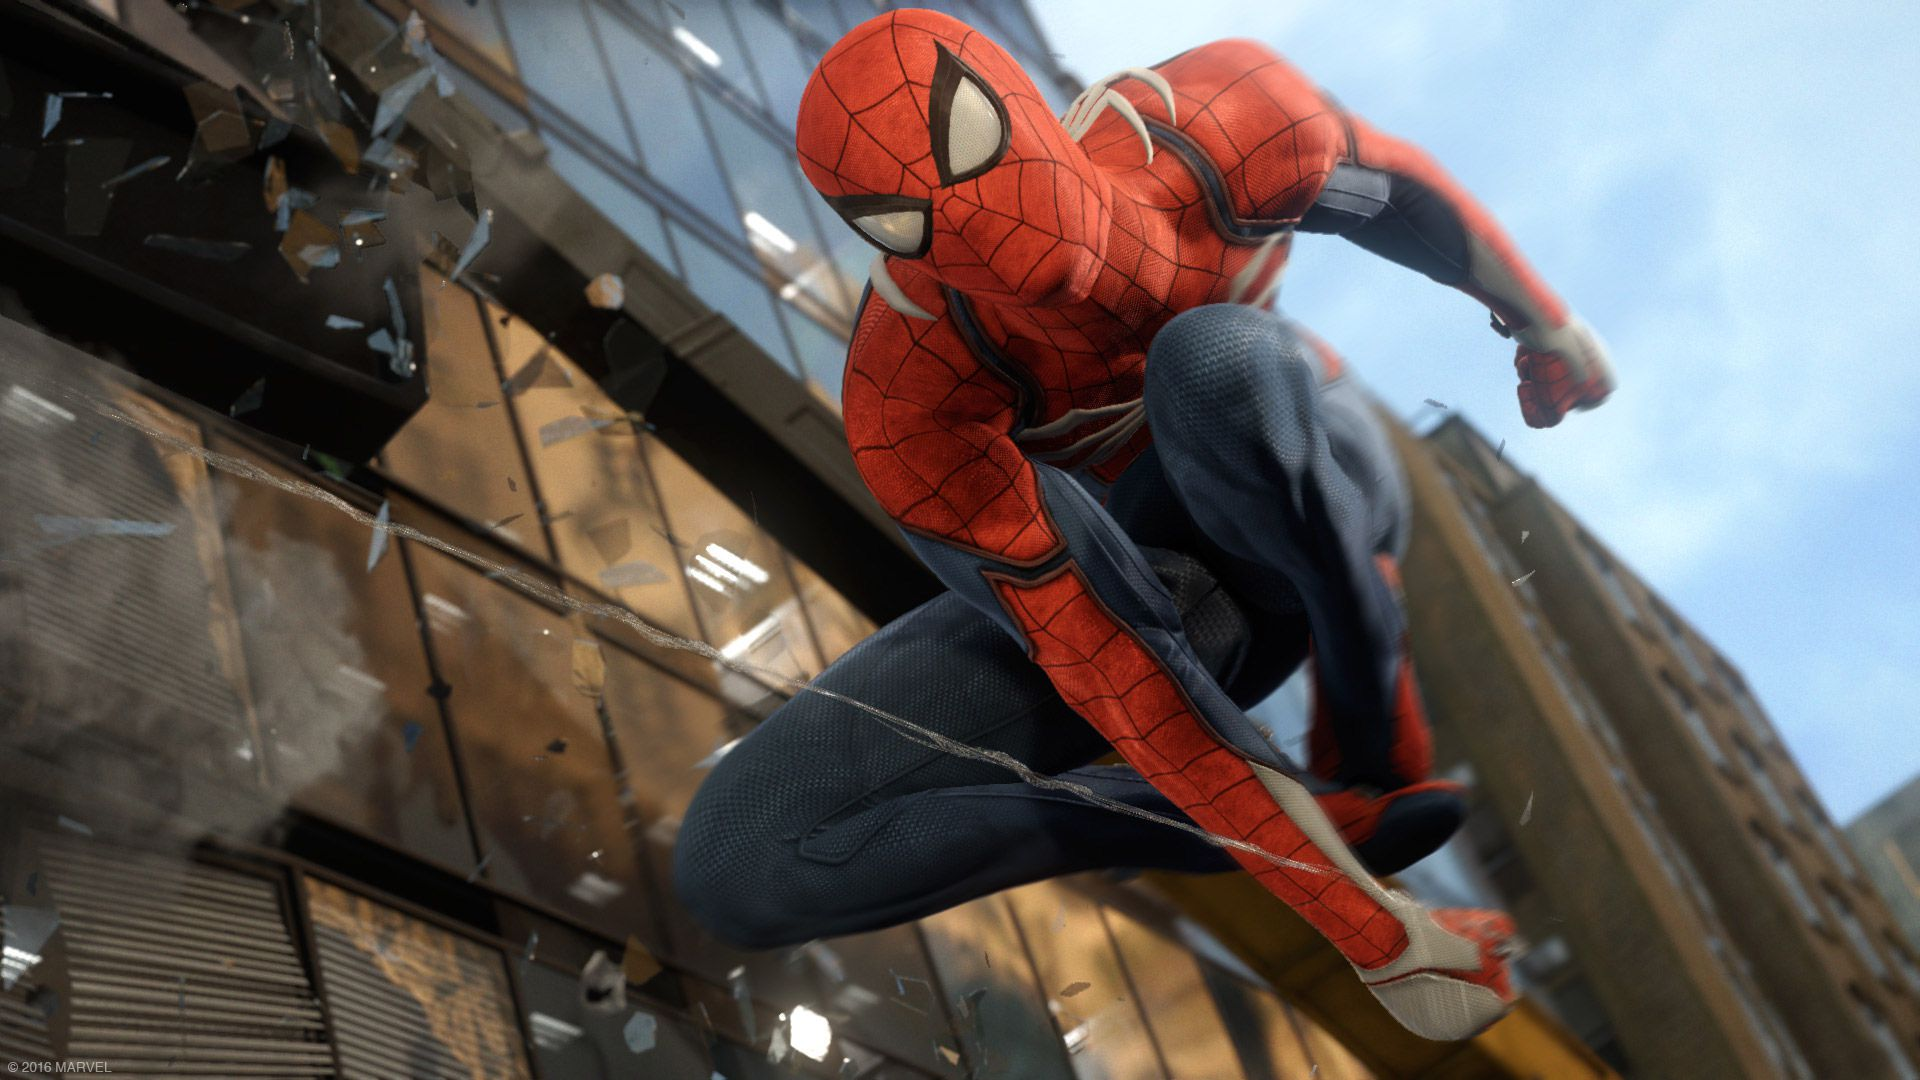 Spider-Man - Spidey swinging past a skyscraper